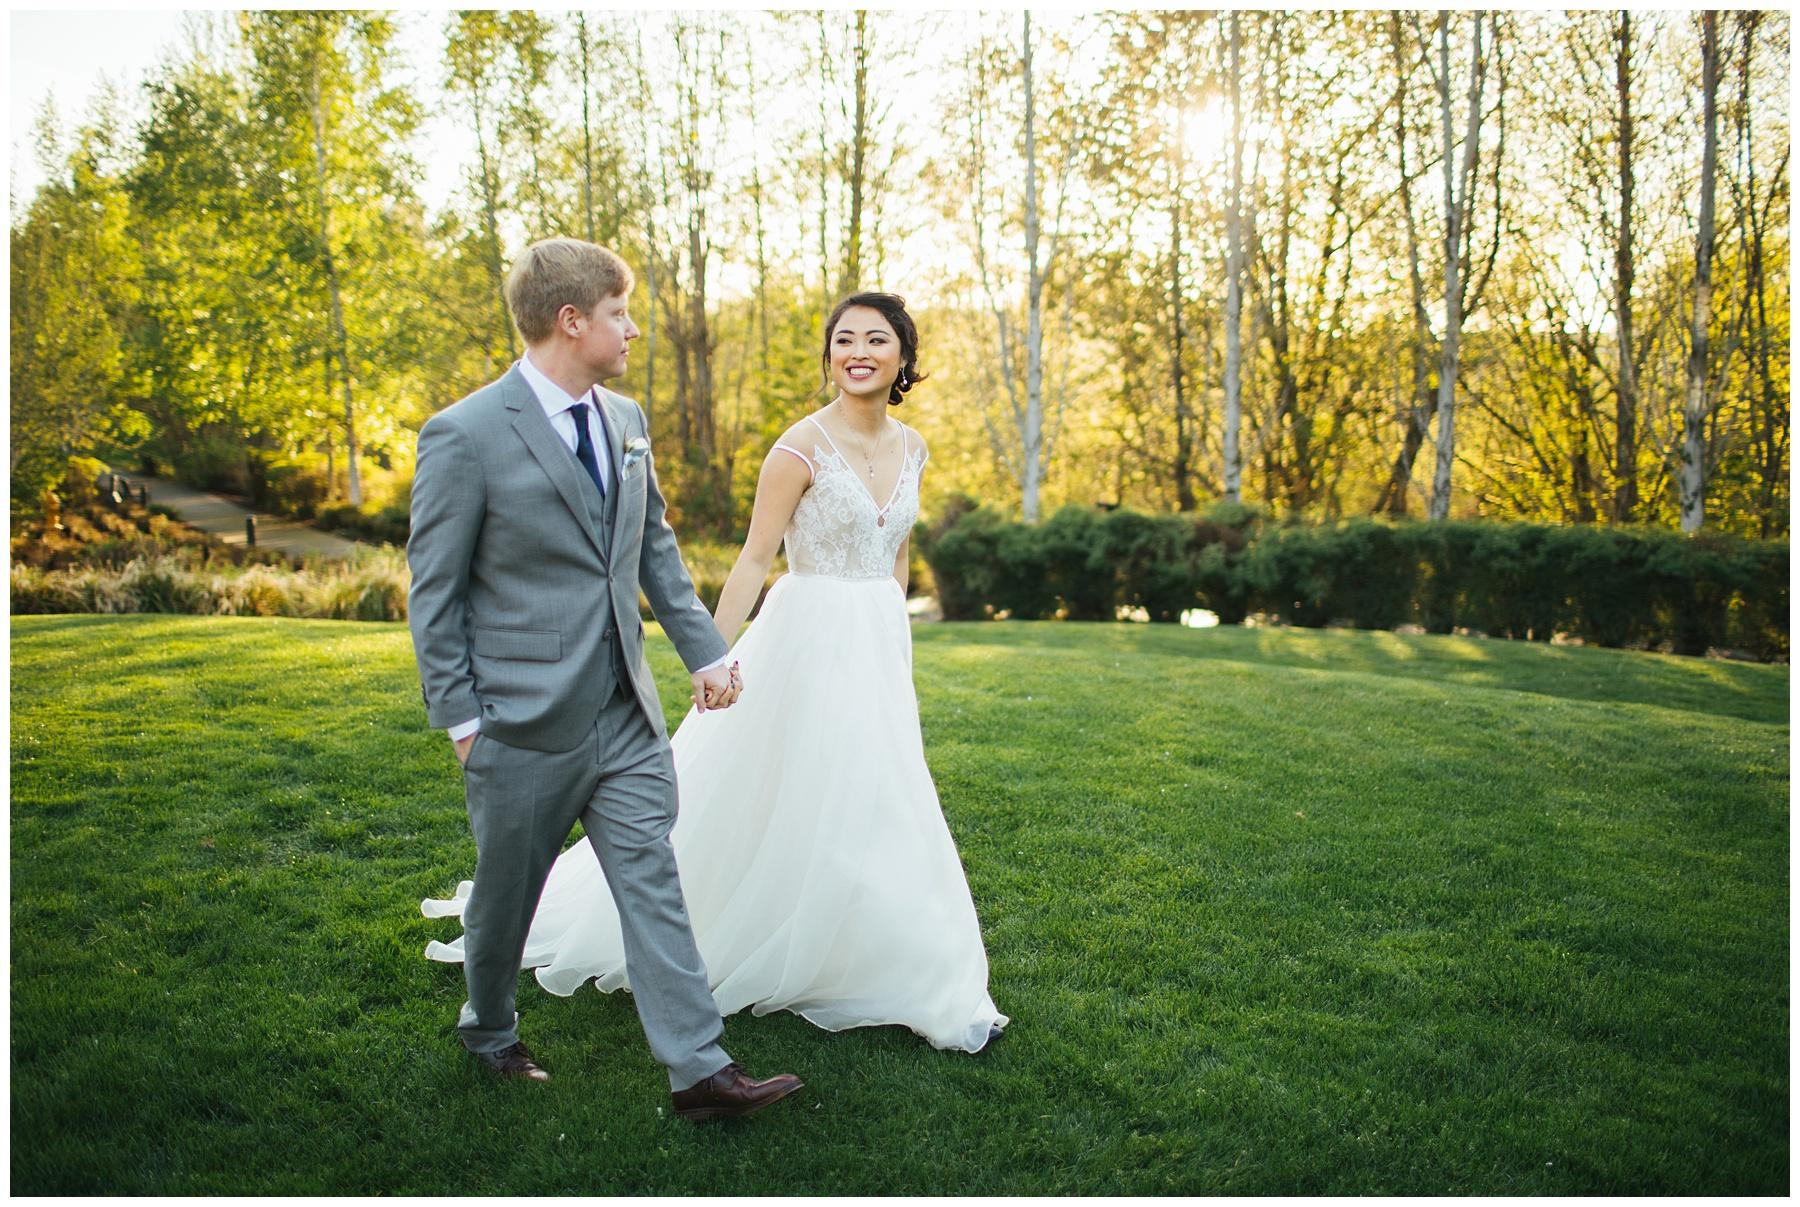 Cedarbrook Lodge Wedding bride and groom portraits during golden hour